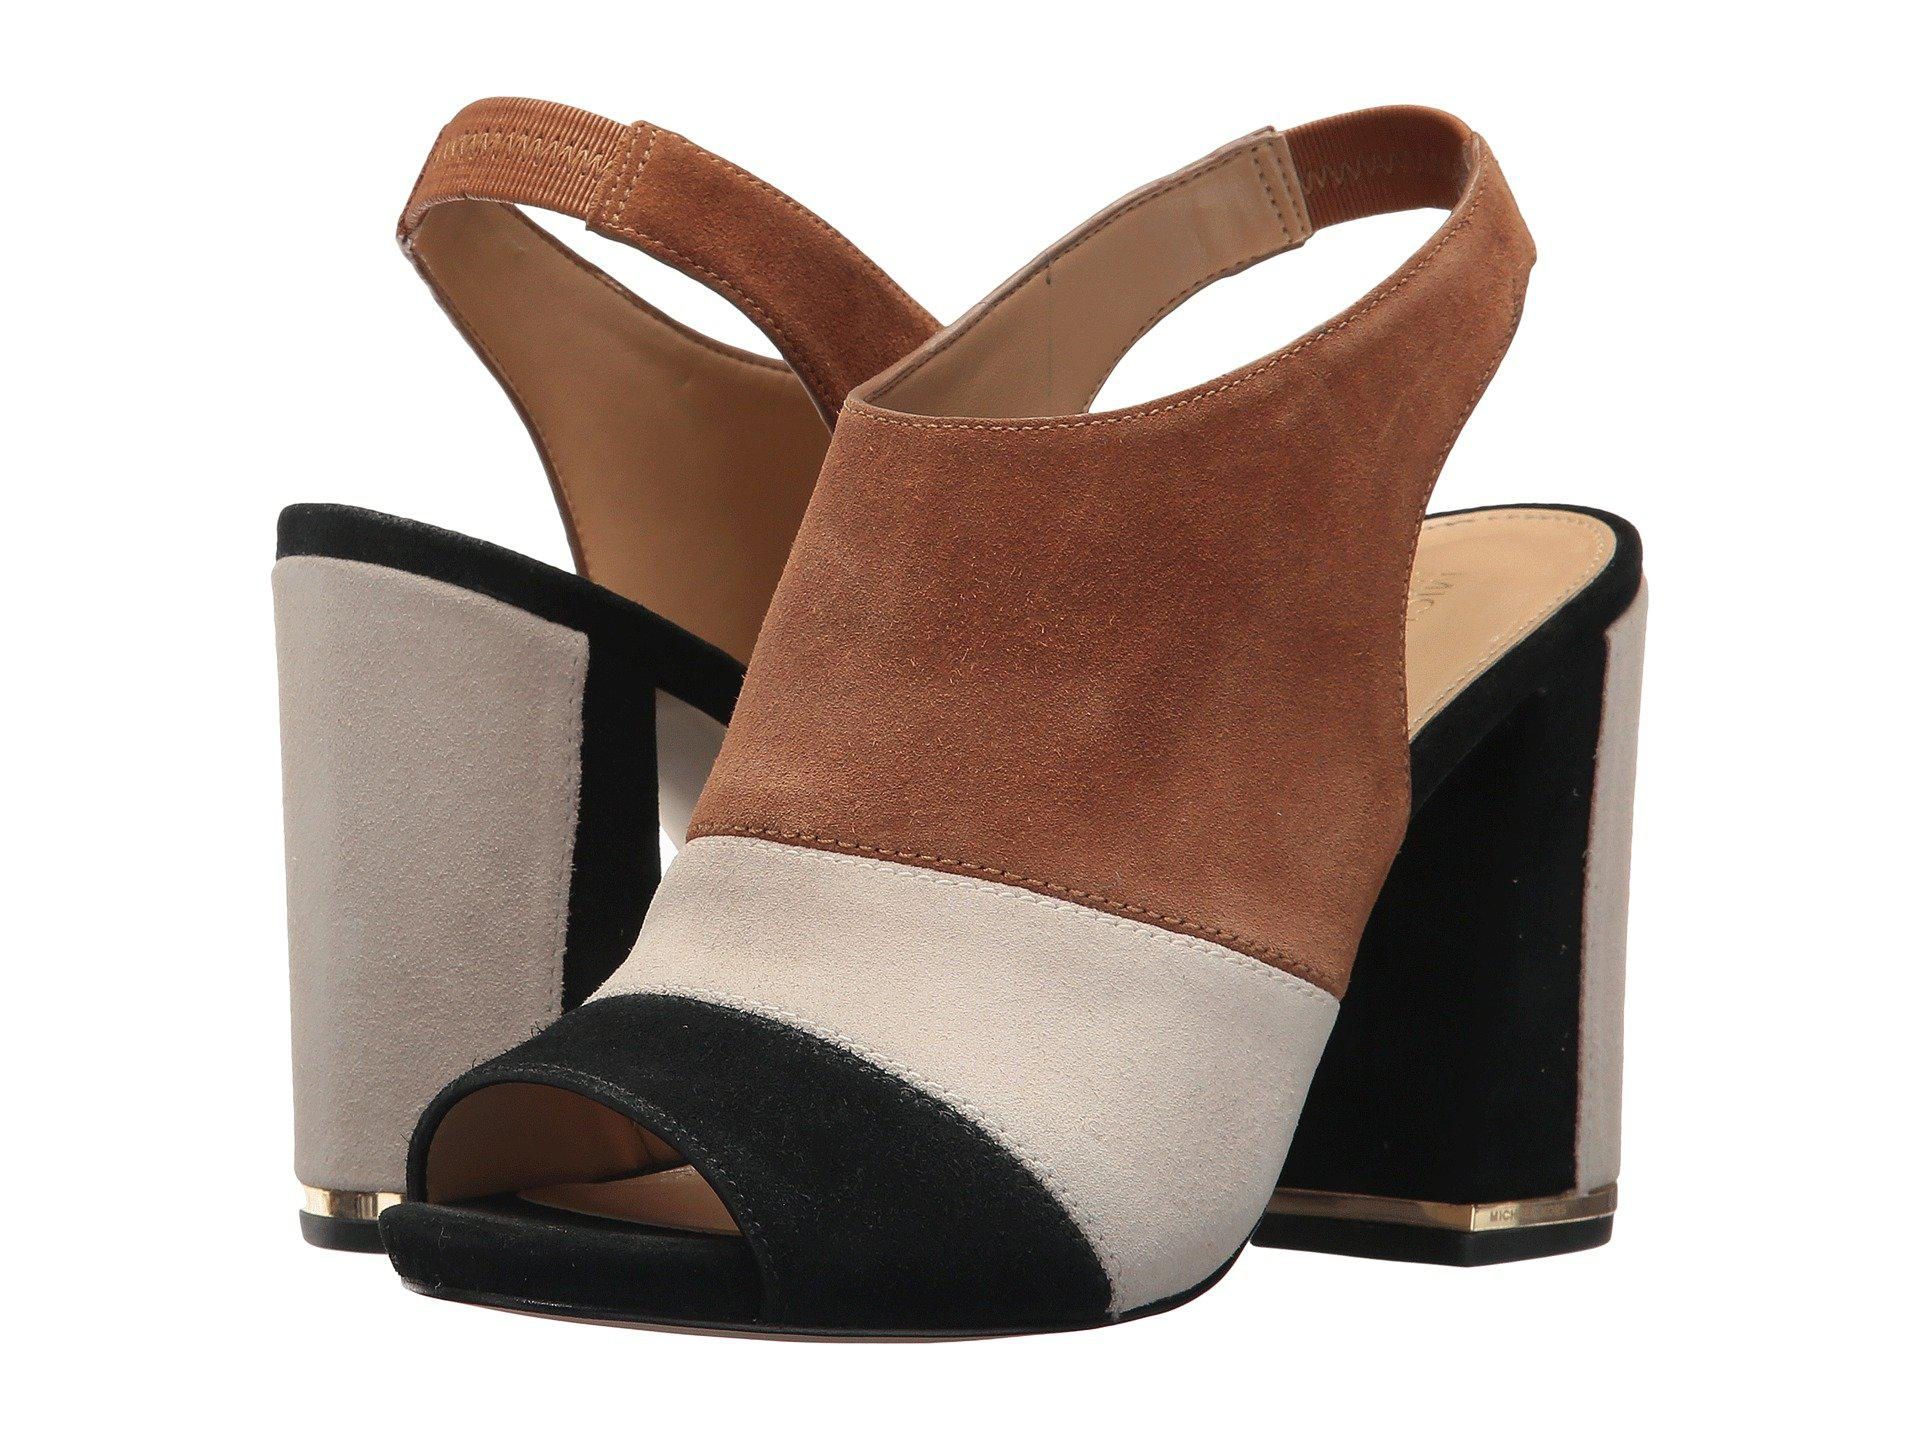 nA7qoEYUGJ Anise open toe sandals 3hgndg